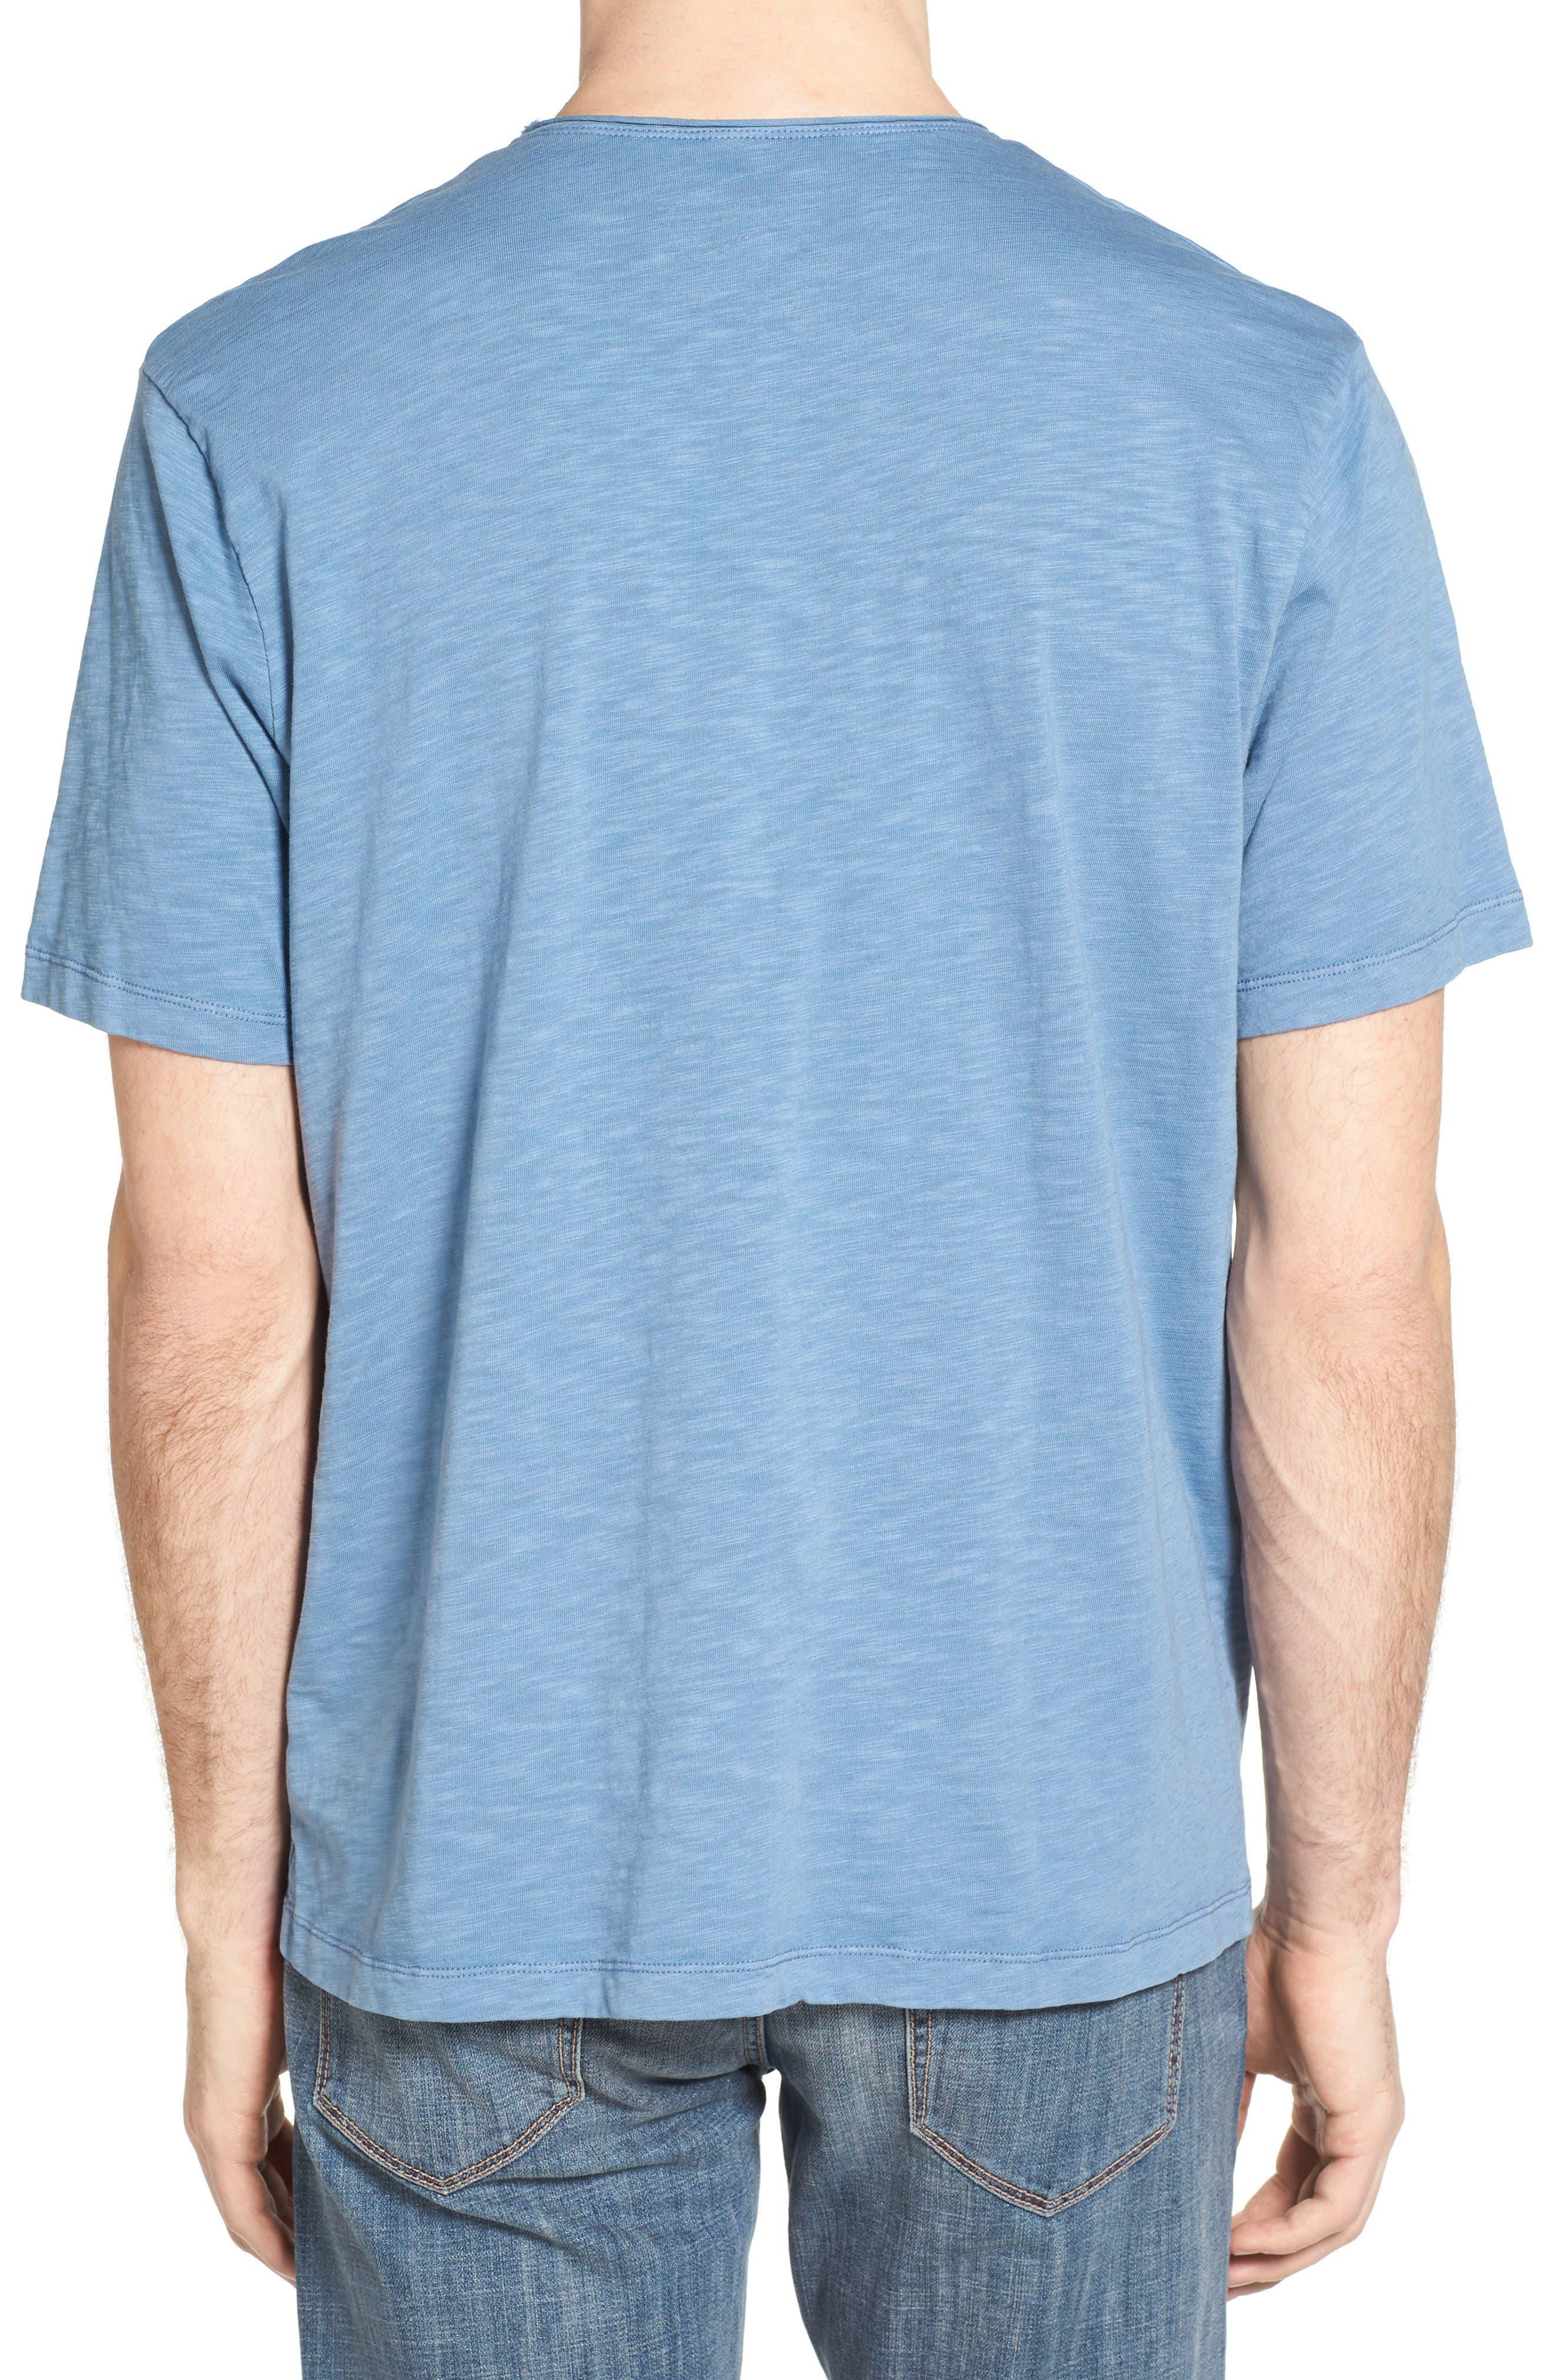 Raw Edge Slub T-Shirt,                             Alternate thumbnail 8, color,                             VINTAGE BLUE